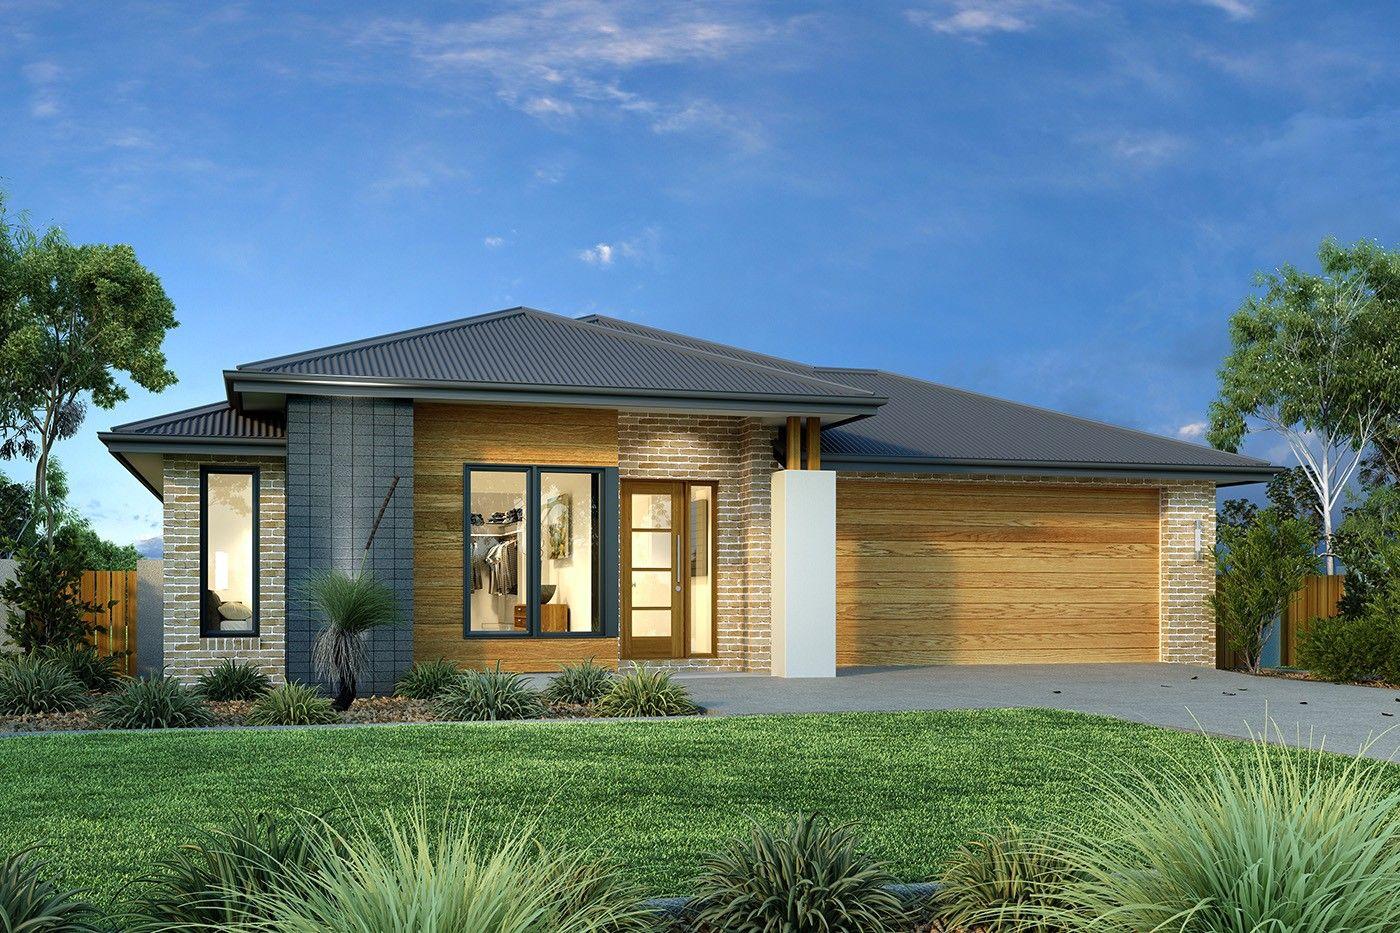 Lot 1505 Montezuma Terrace, The Outlook Estate, Dubbo NSW 2830, Image 0